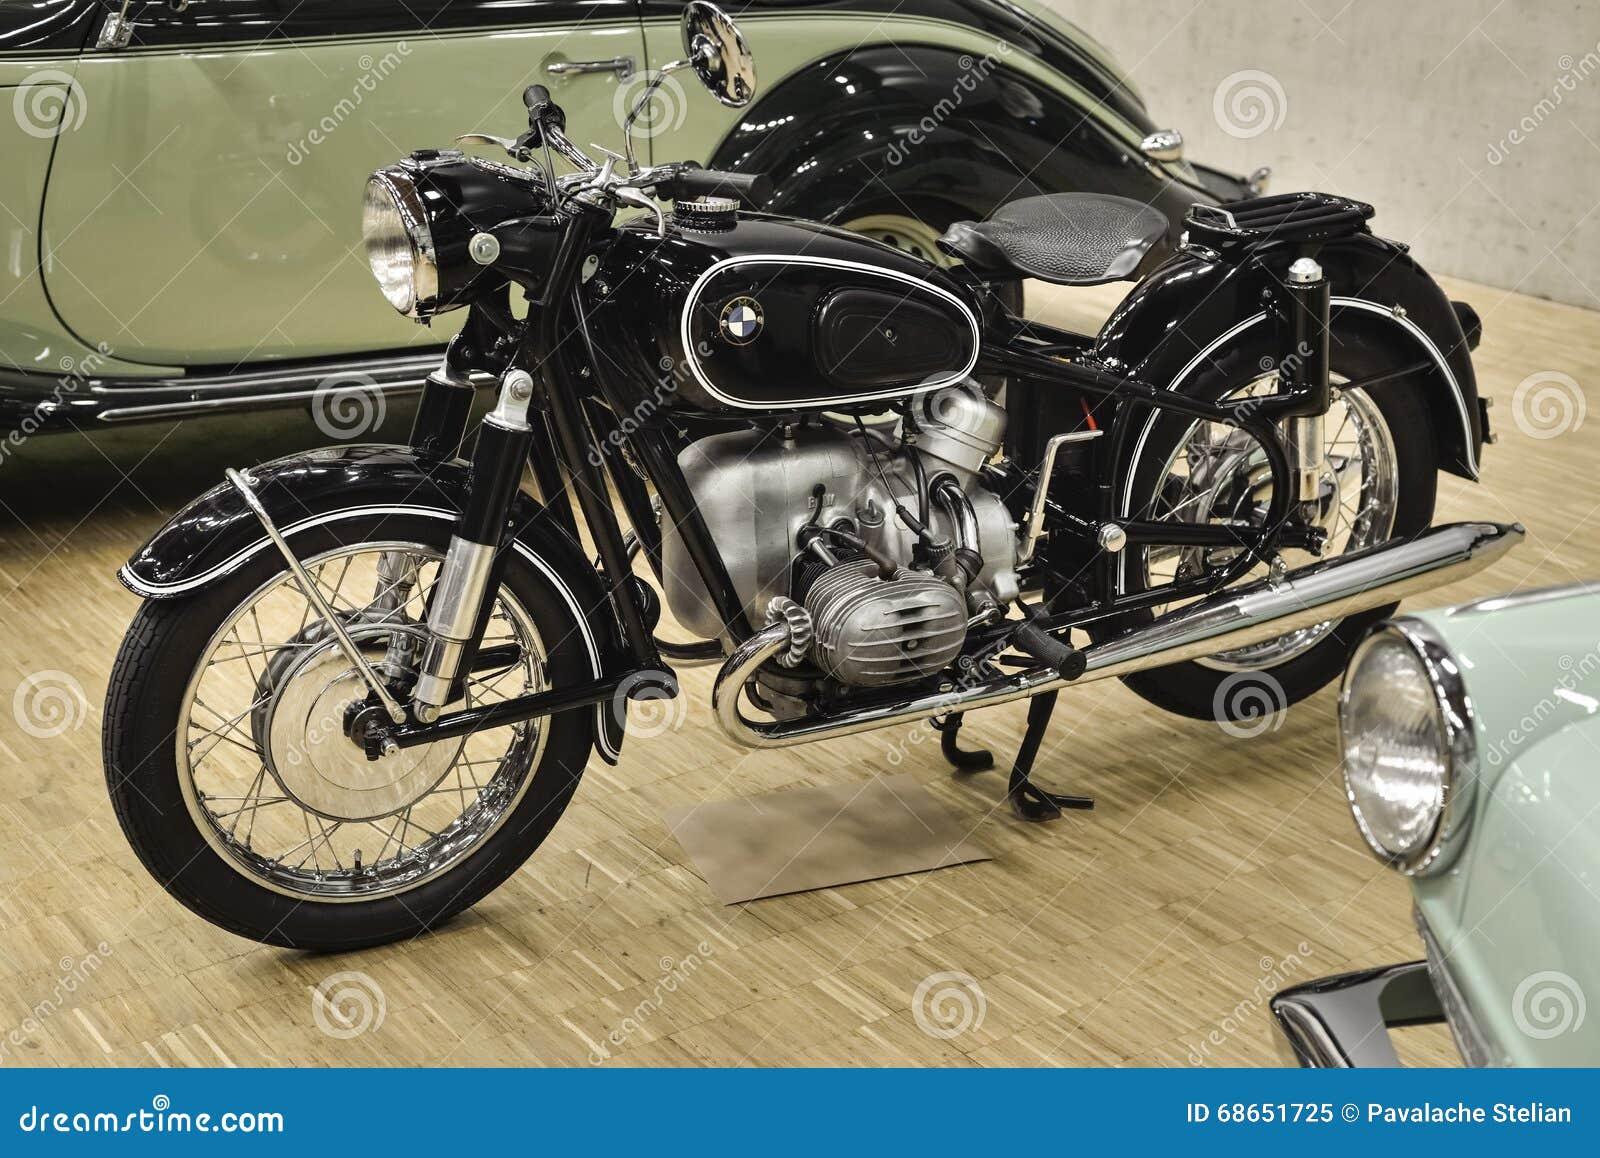 Bmw R Powered Cylinder Ohv Boxer Engine Beautiful Old Motorcycle Switzerland